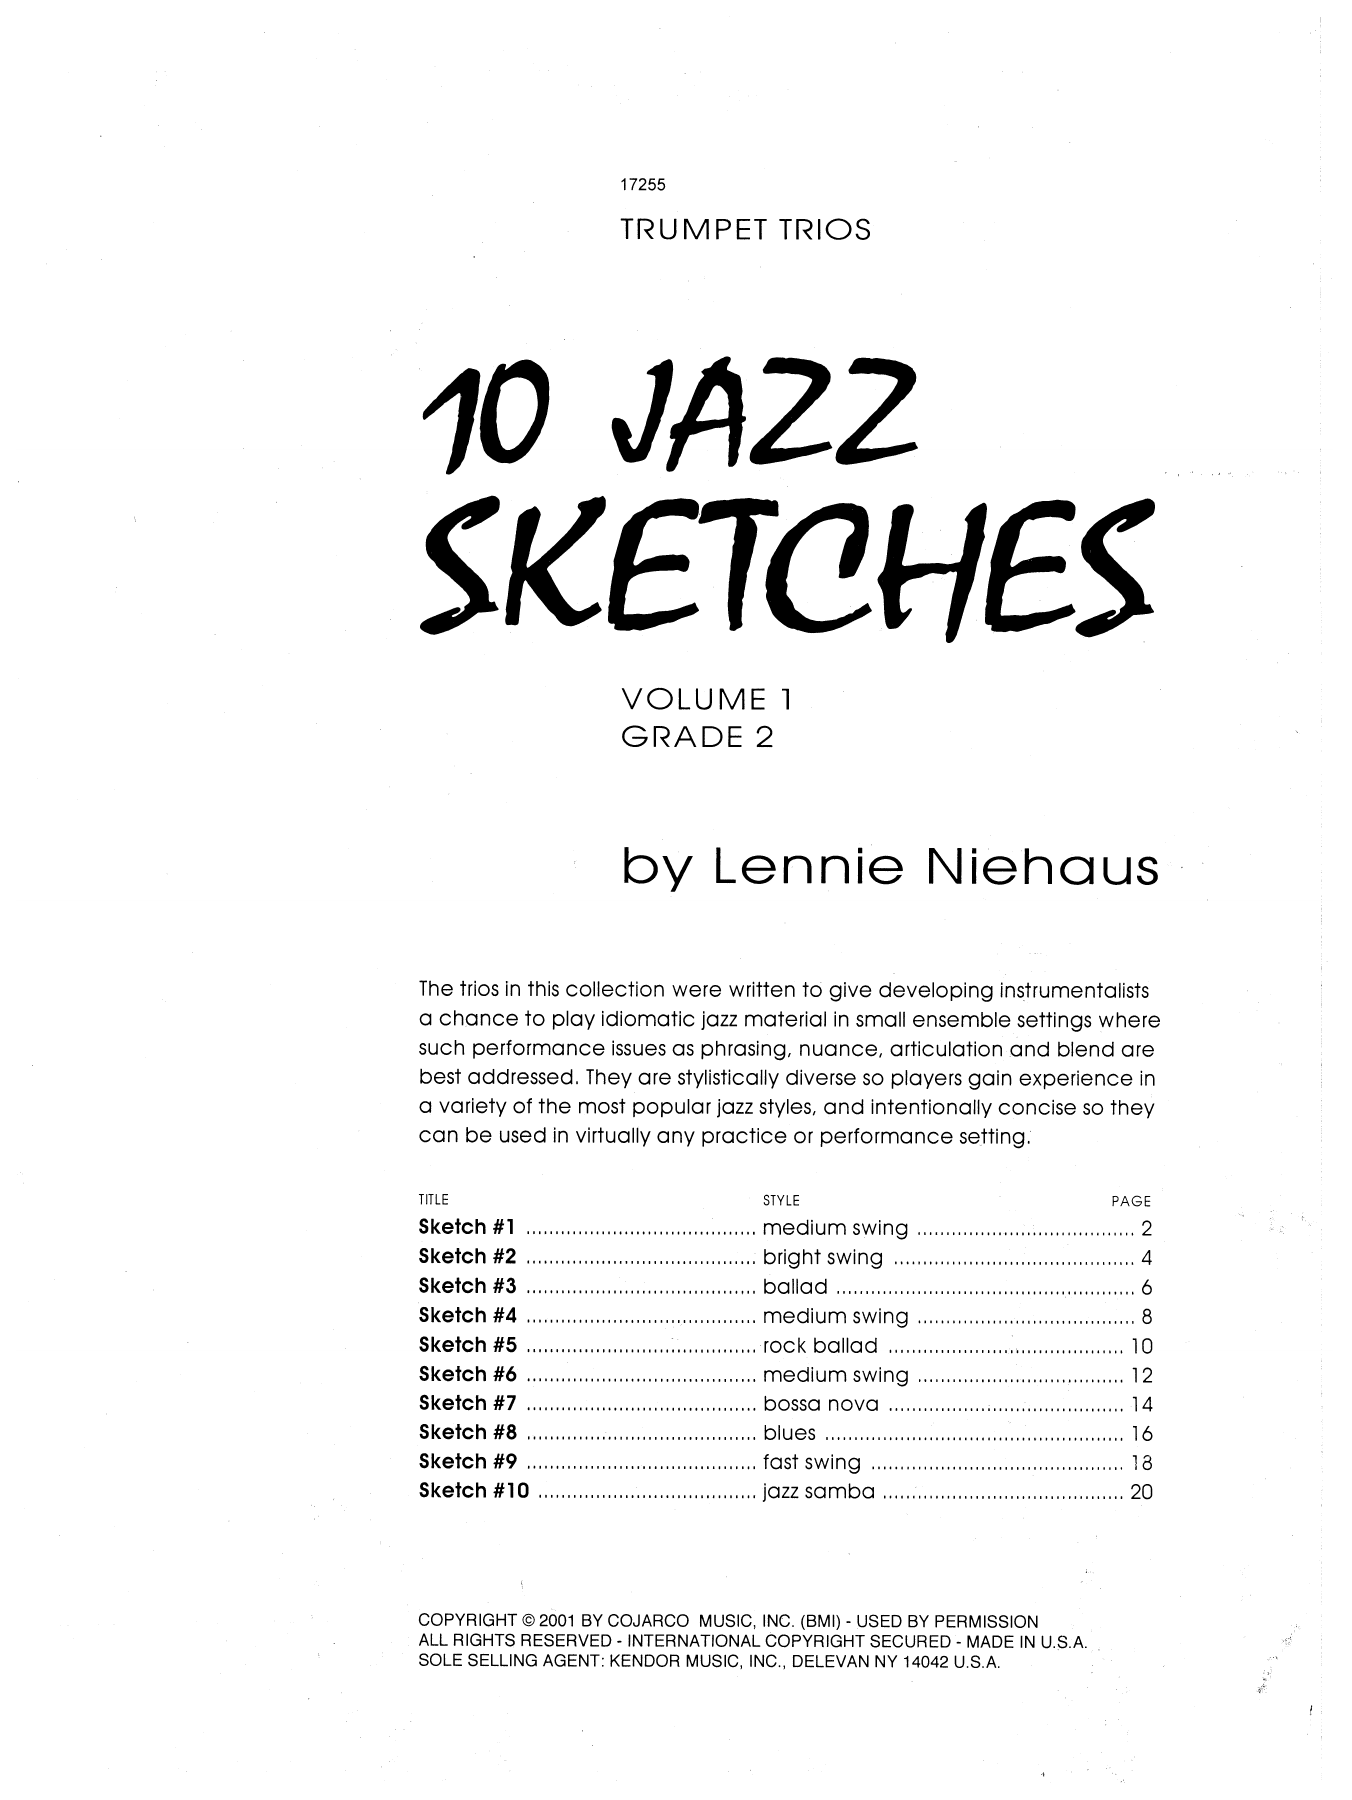 10 Jazz Sketches, Volume 1 sheet music